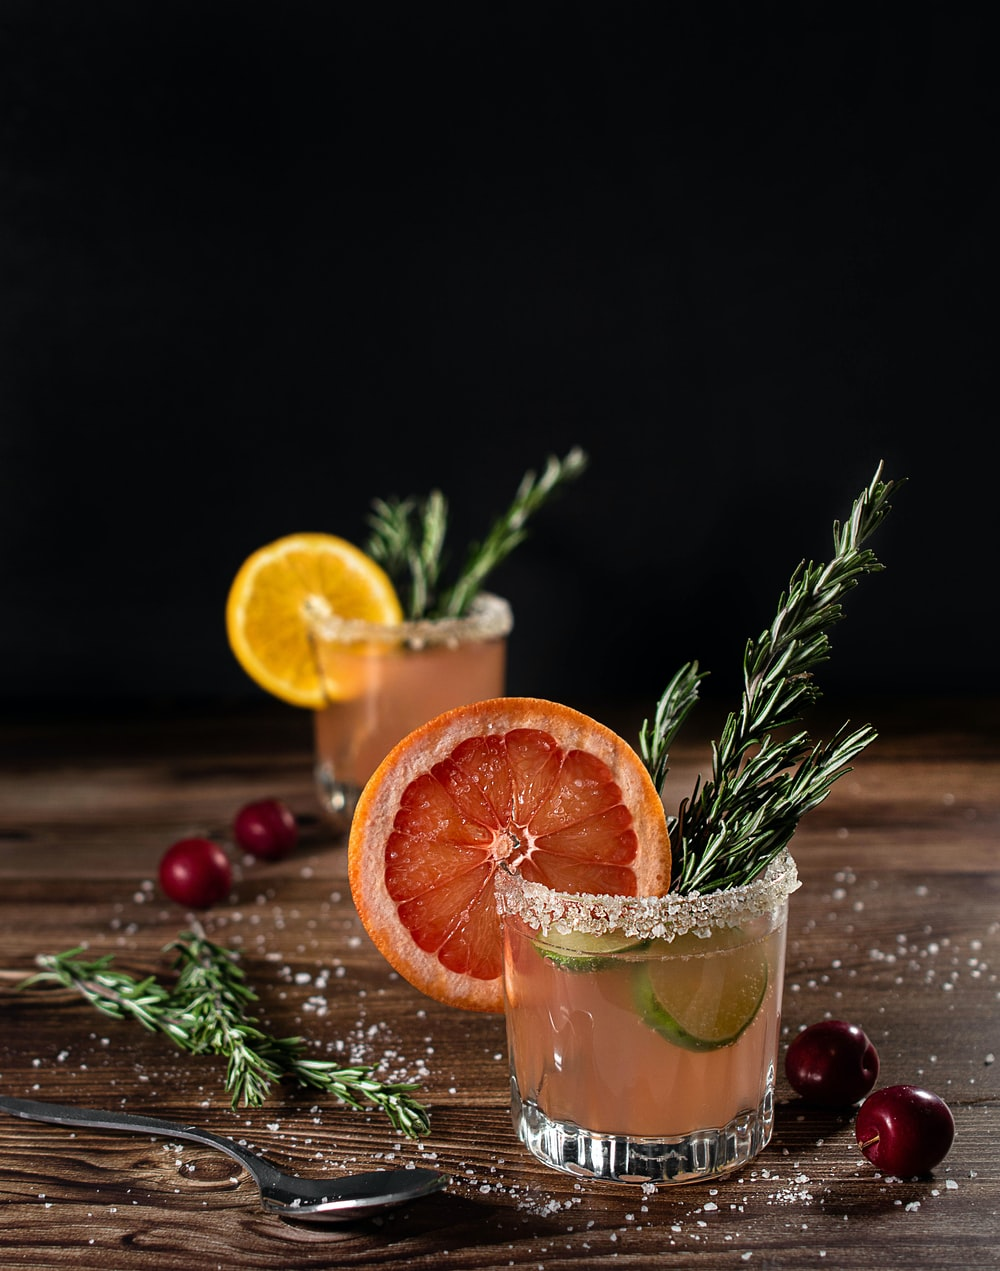 orange fruit on clear drinking glass